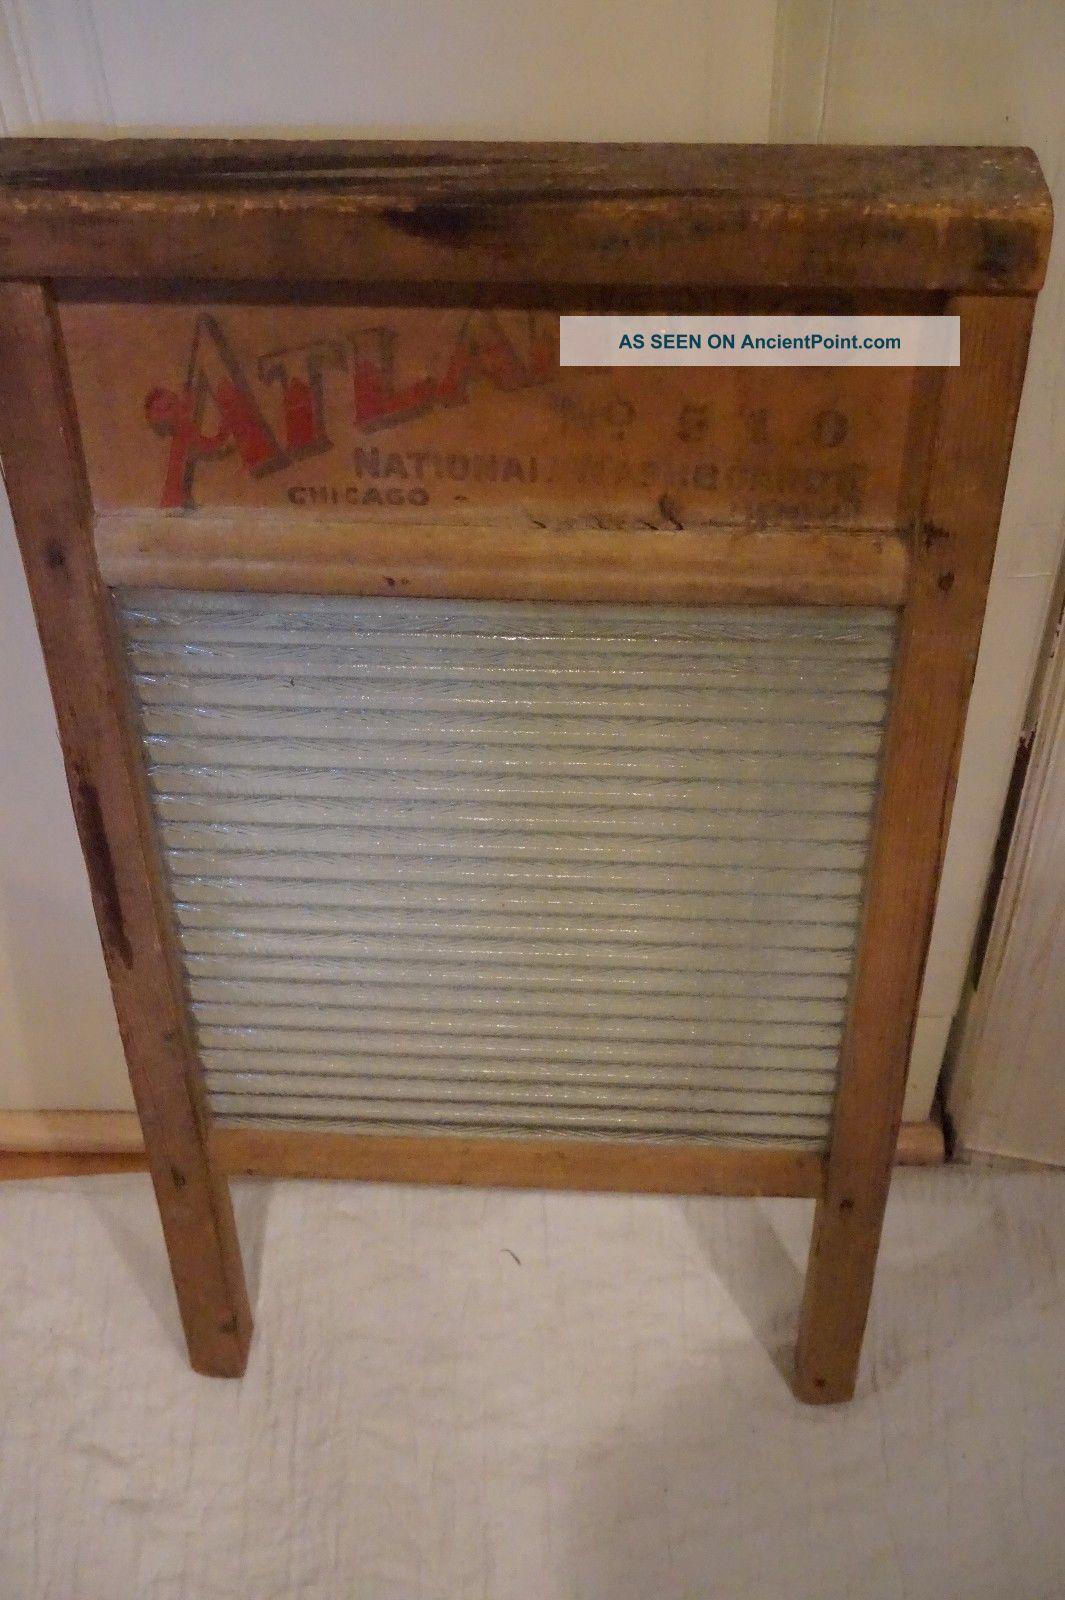 Vintage Washboard Atlantic Chicago Washboard Other Antique Furniture photo